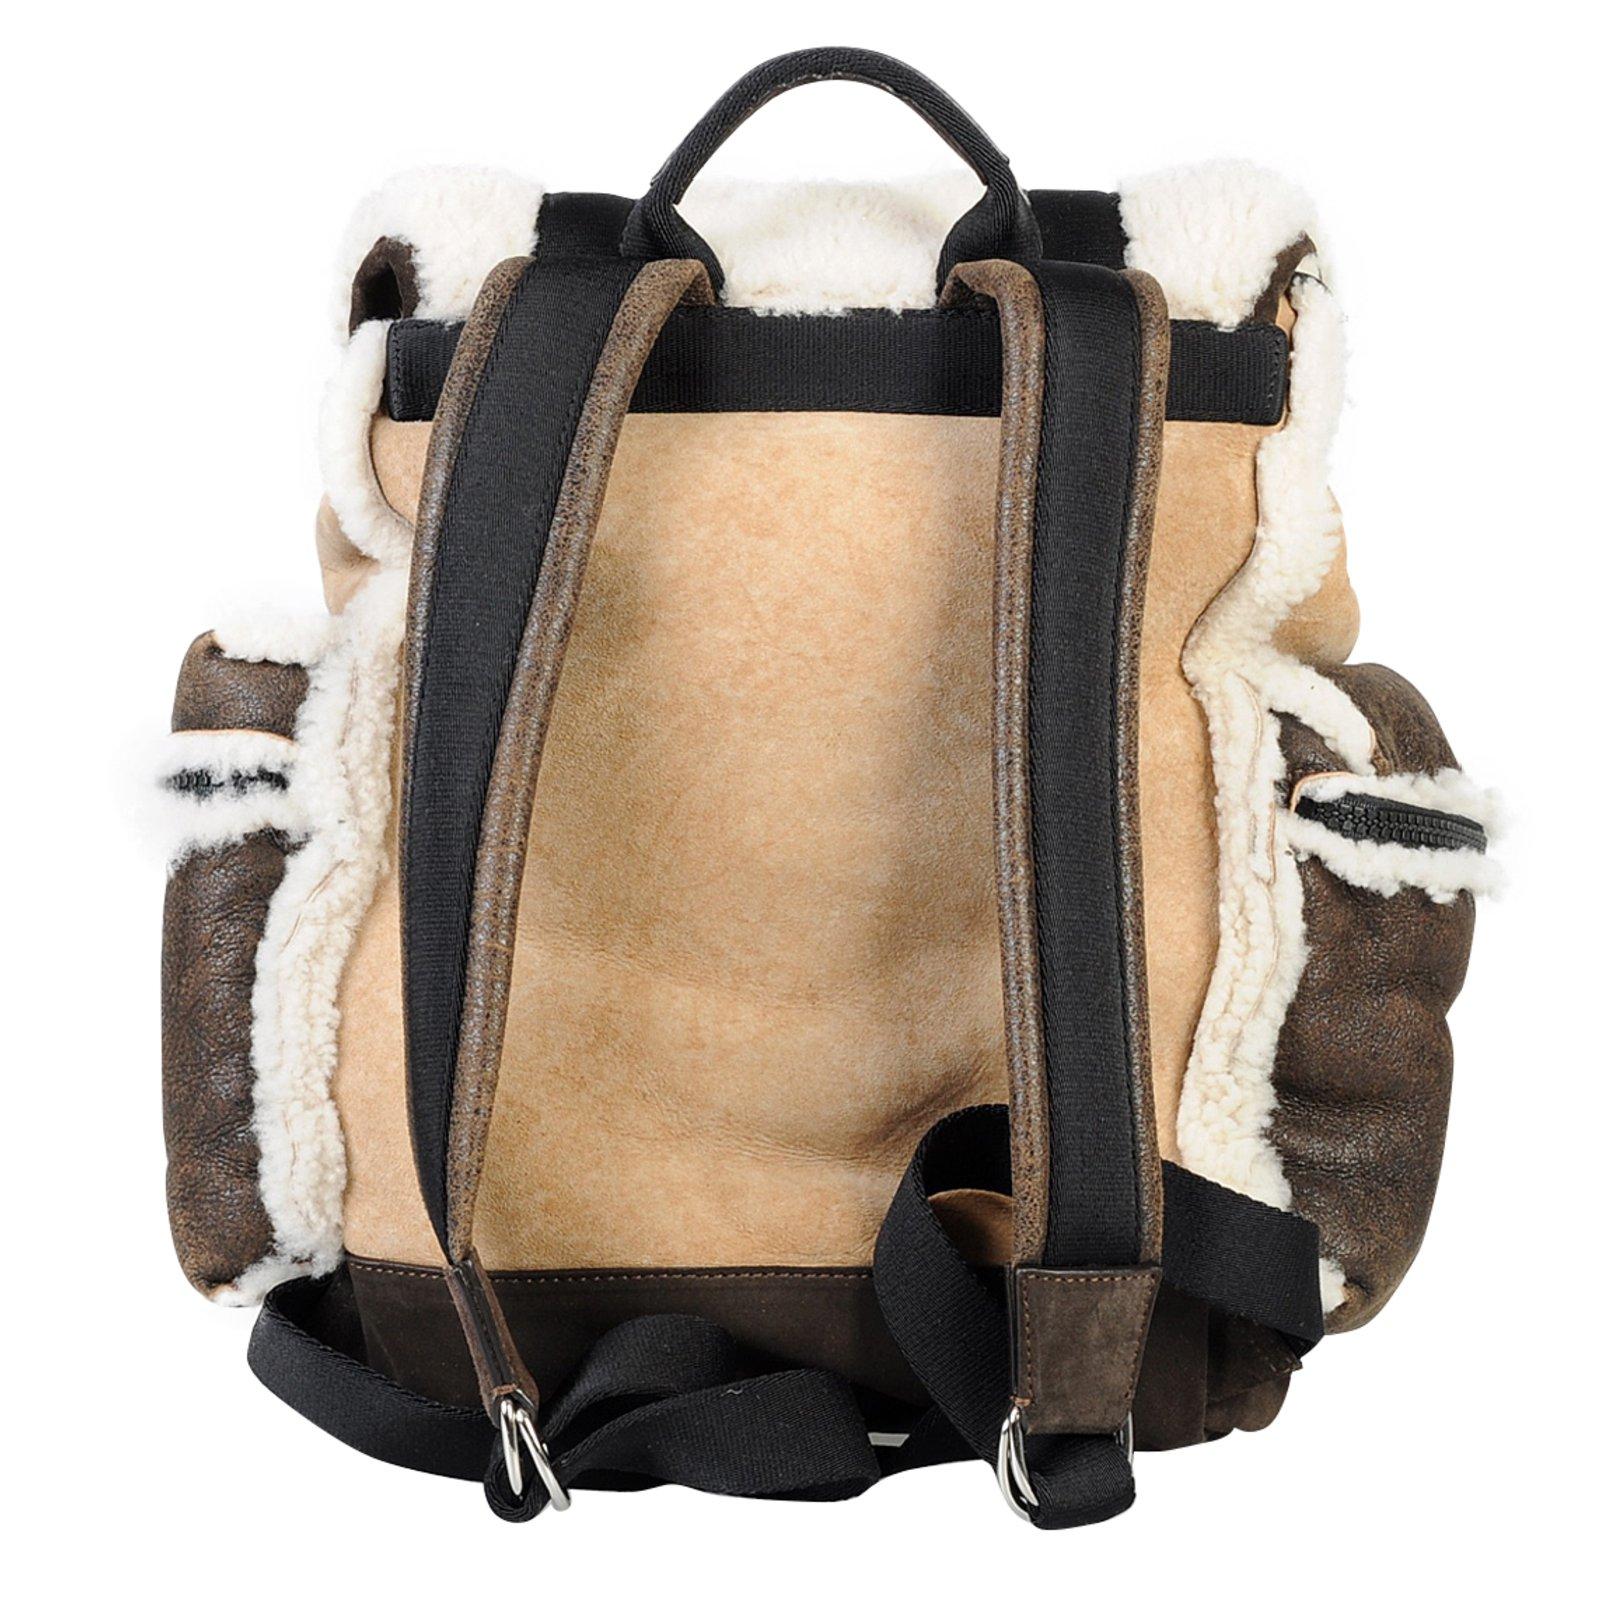 2a2da97b1d9 Dsquared2 Shearling backpack Bags Briefcases Fur Brown ref.58971 - Joli  Closet